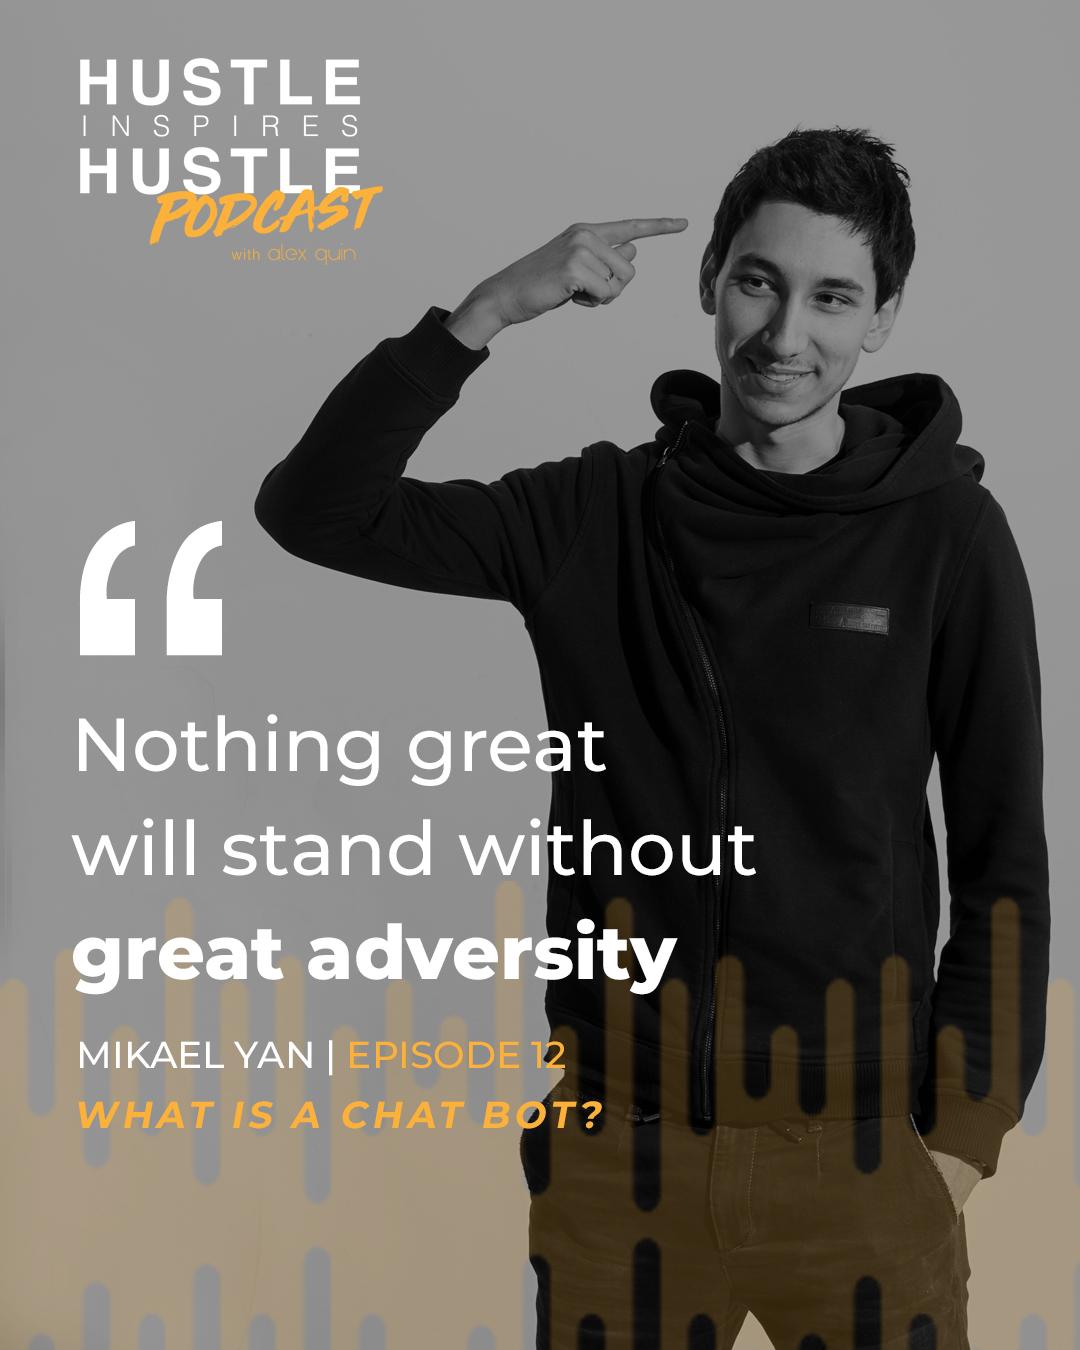 Mikael Yan & Alex Quin // On Hustle Inspires Hustle Podcast